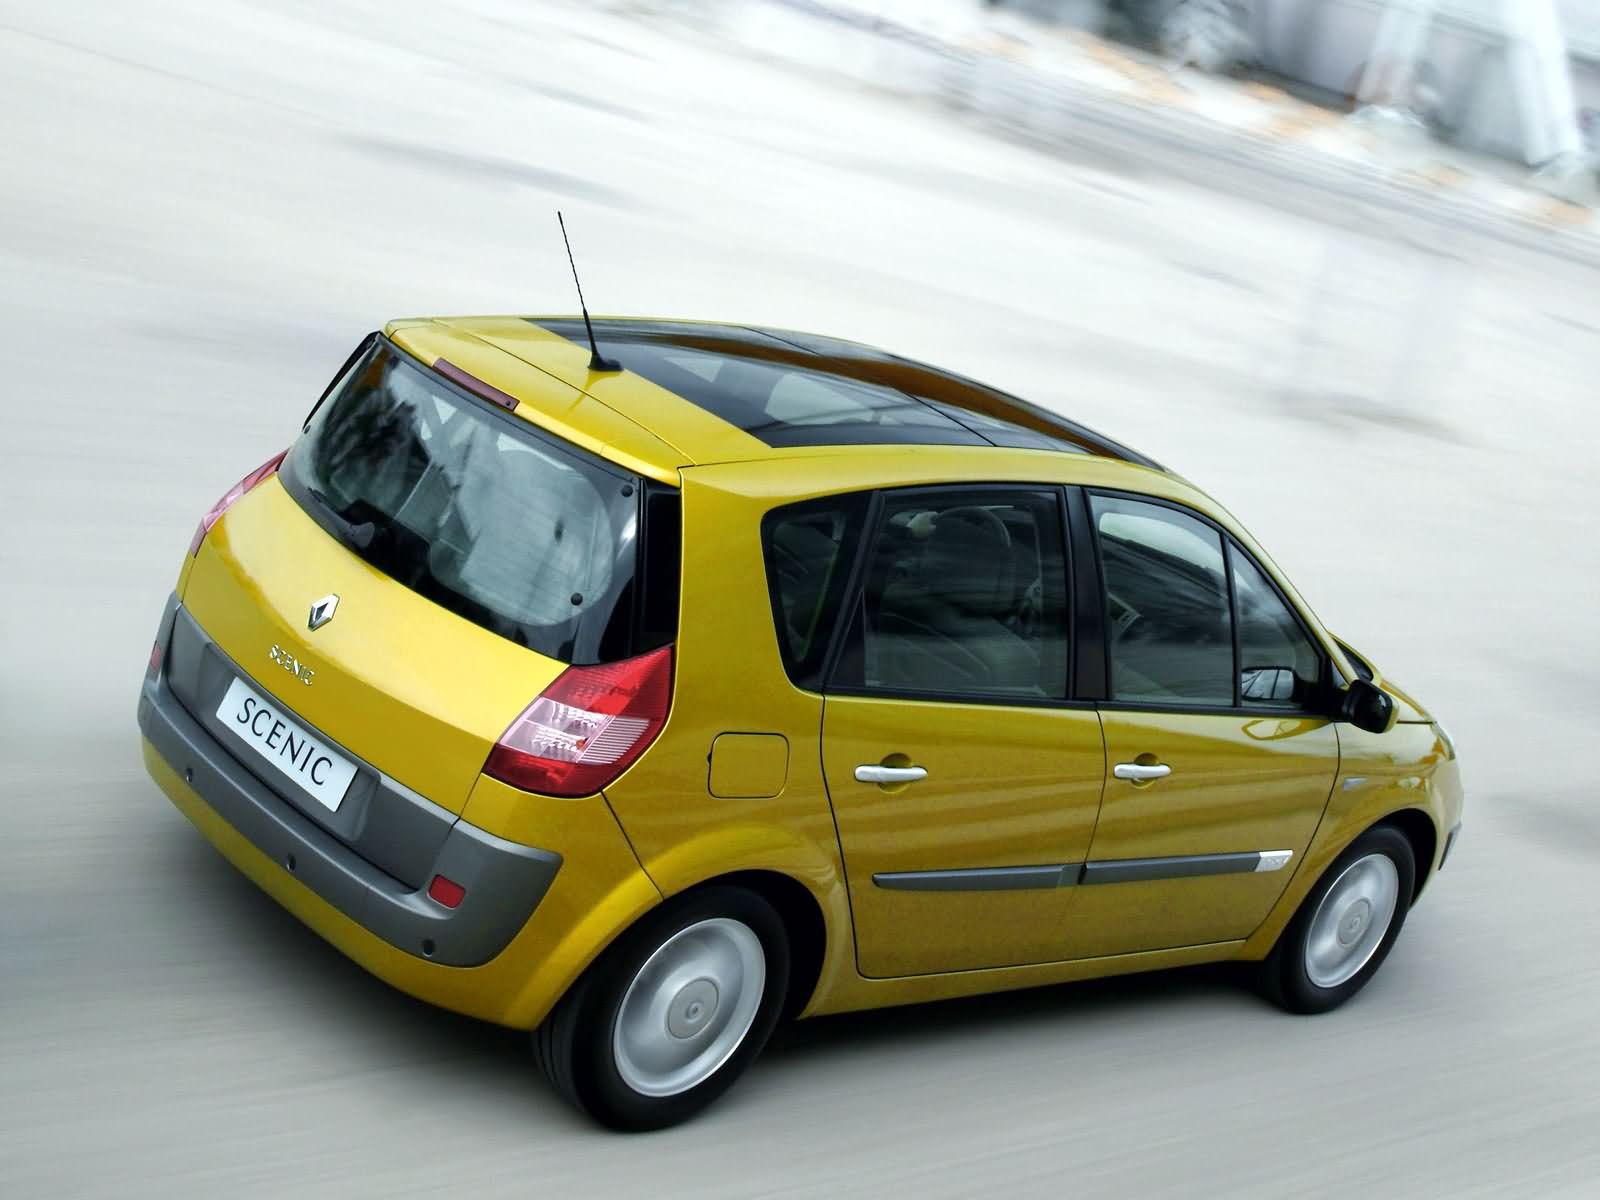 Renault Scenic II — описание модели